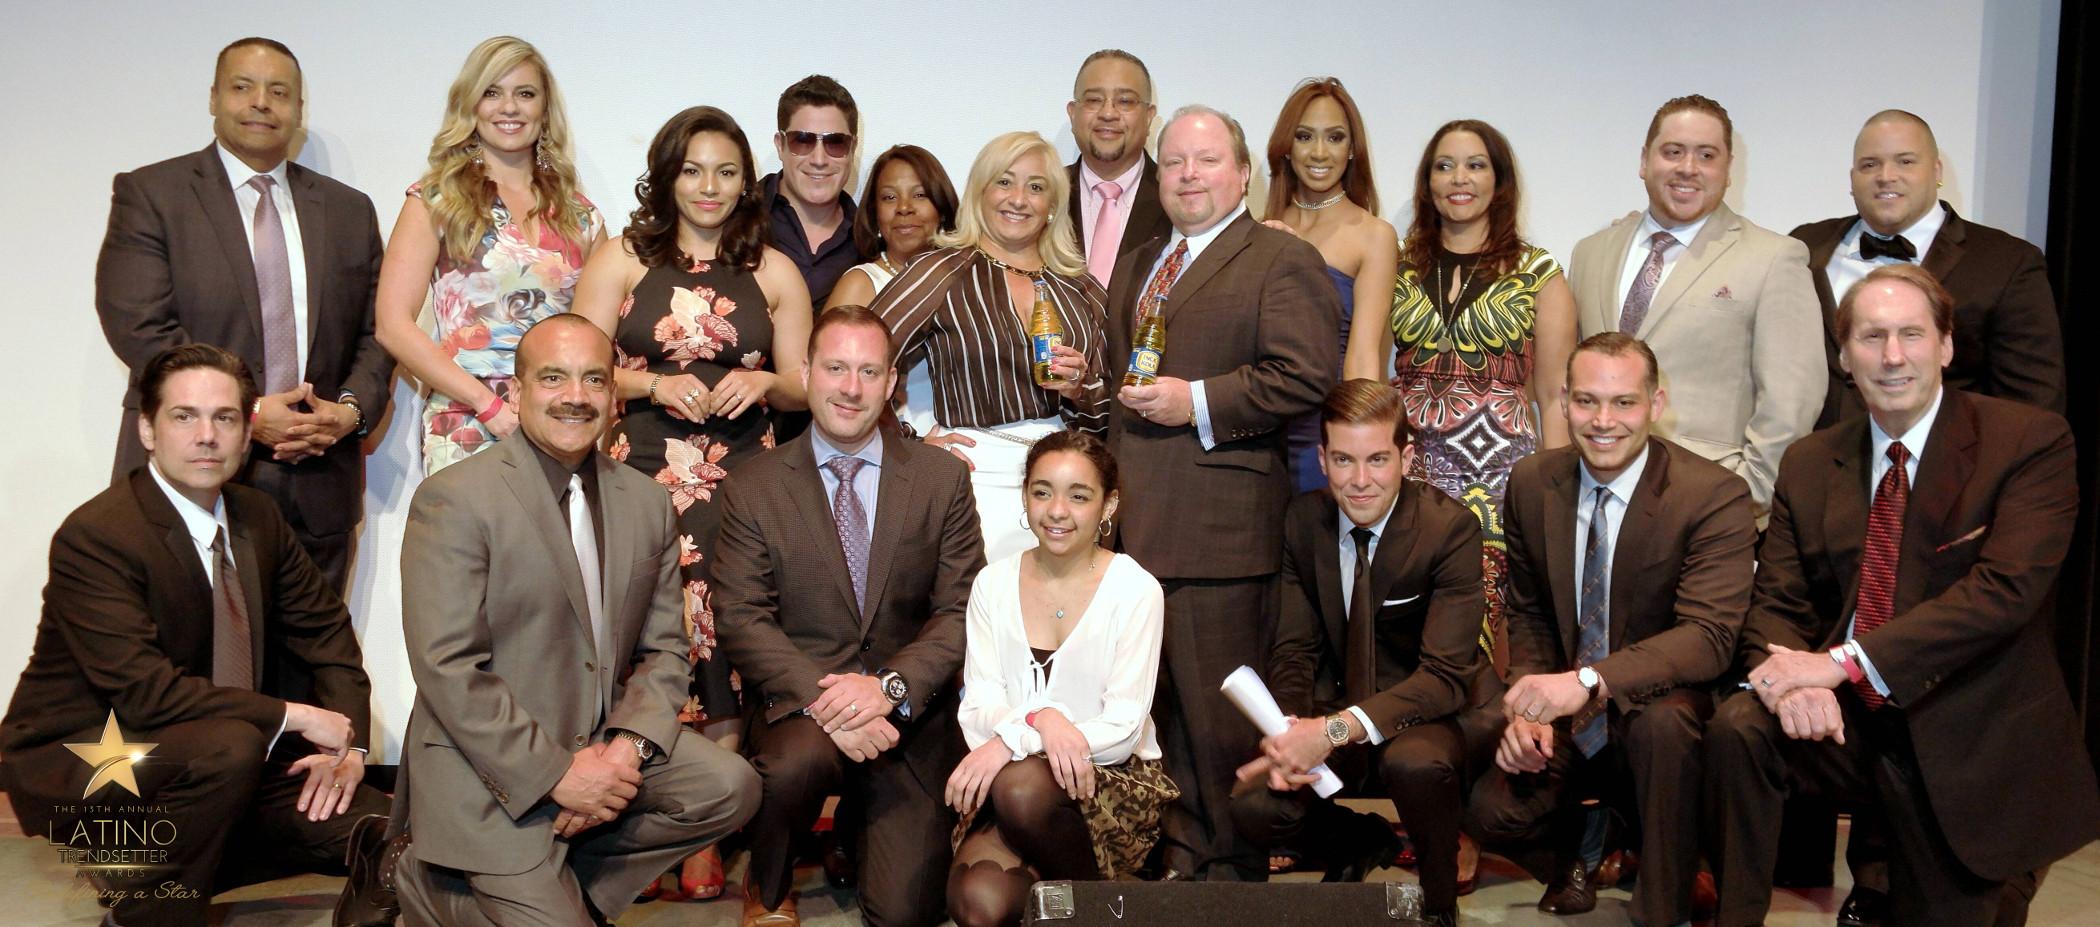 Video Recap of 14th Annual Latino Trendsetter Awards